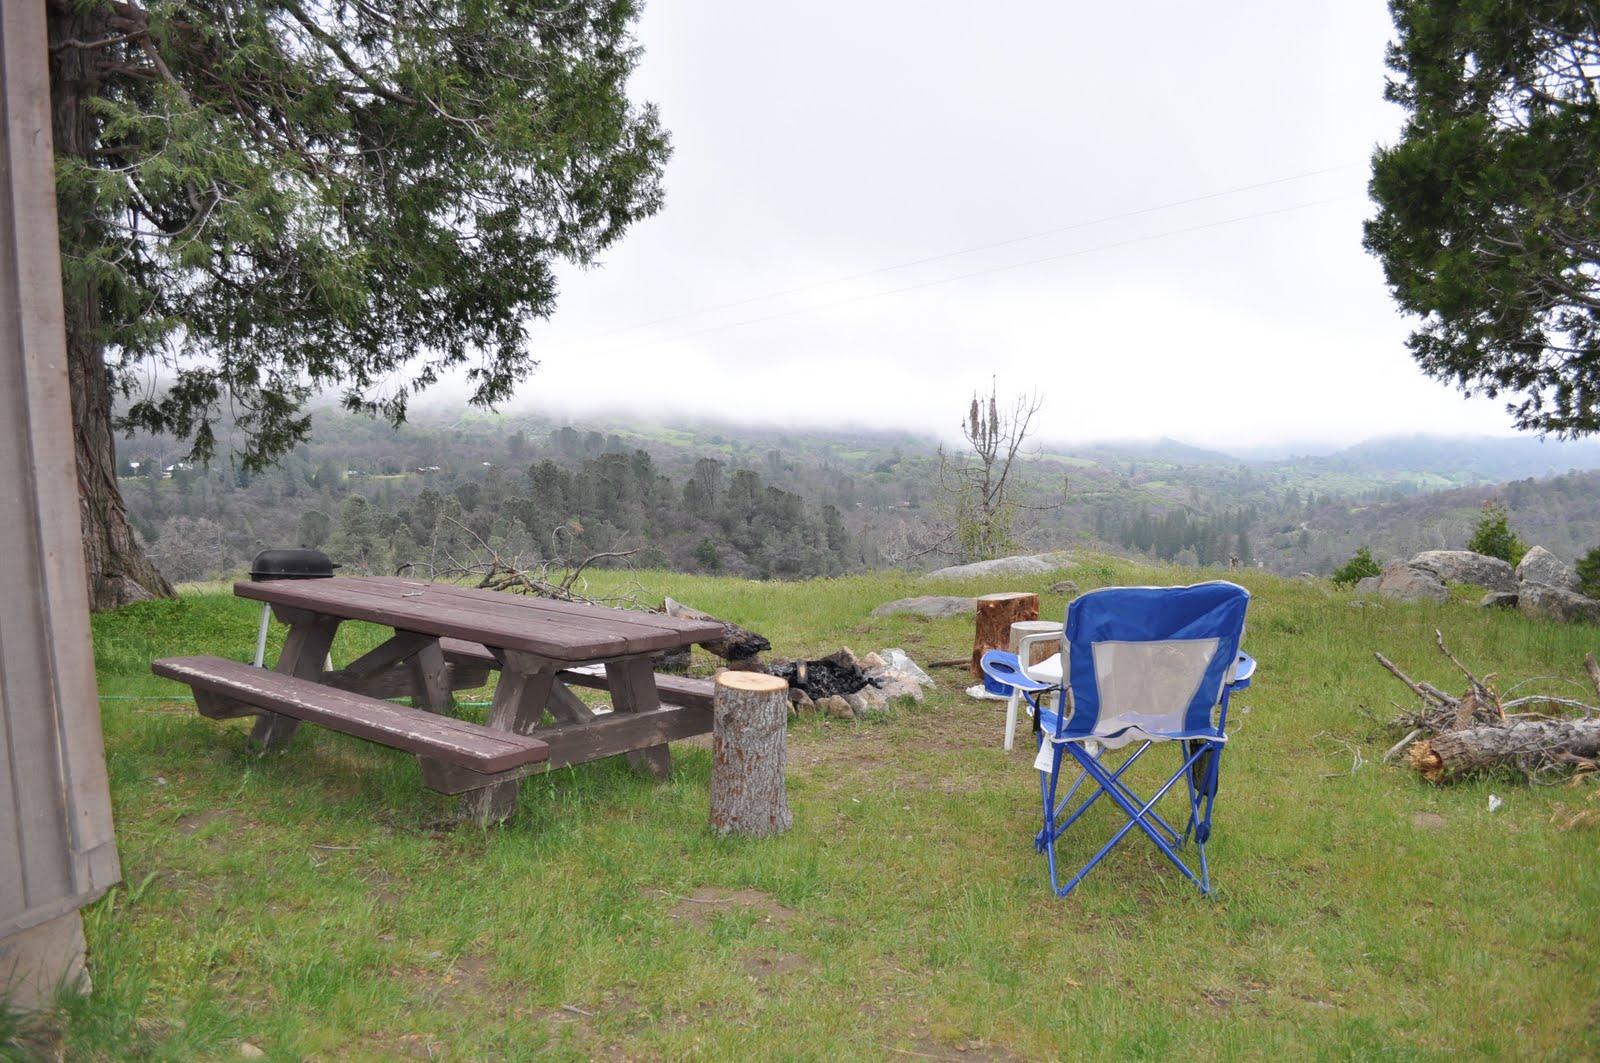 visalia type cabins campgrounds sequoia site california in lodging national park koa